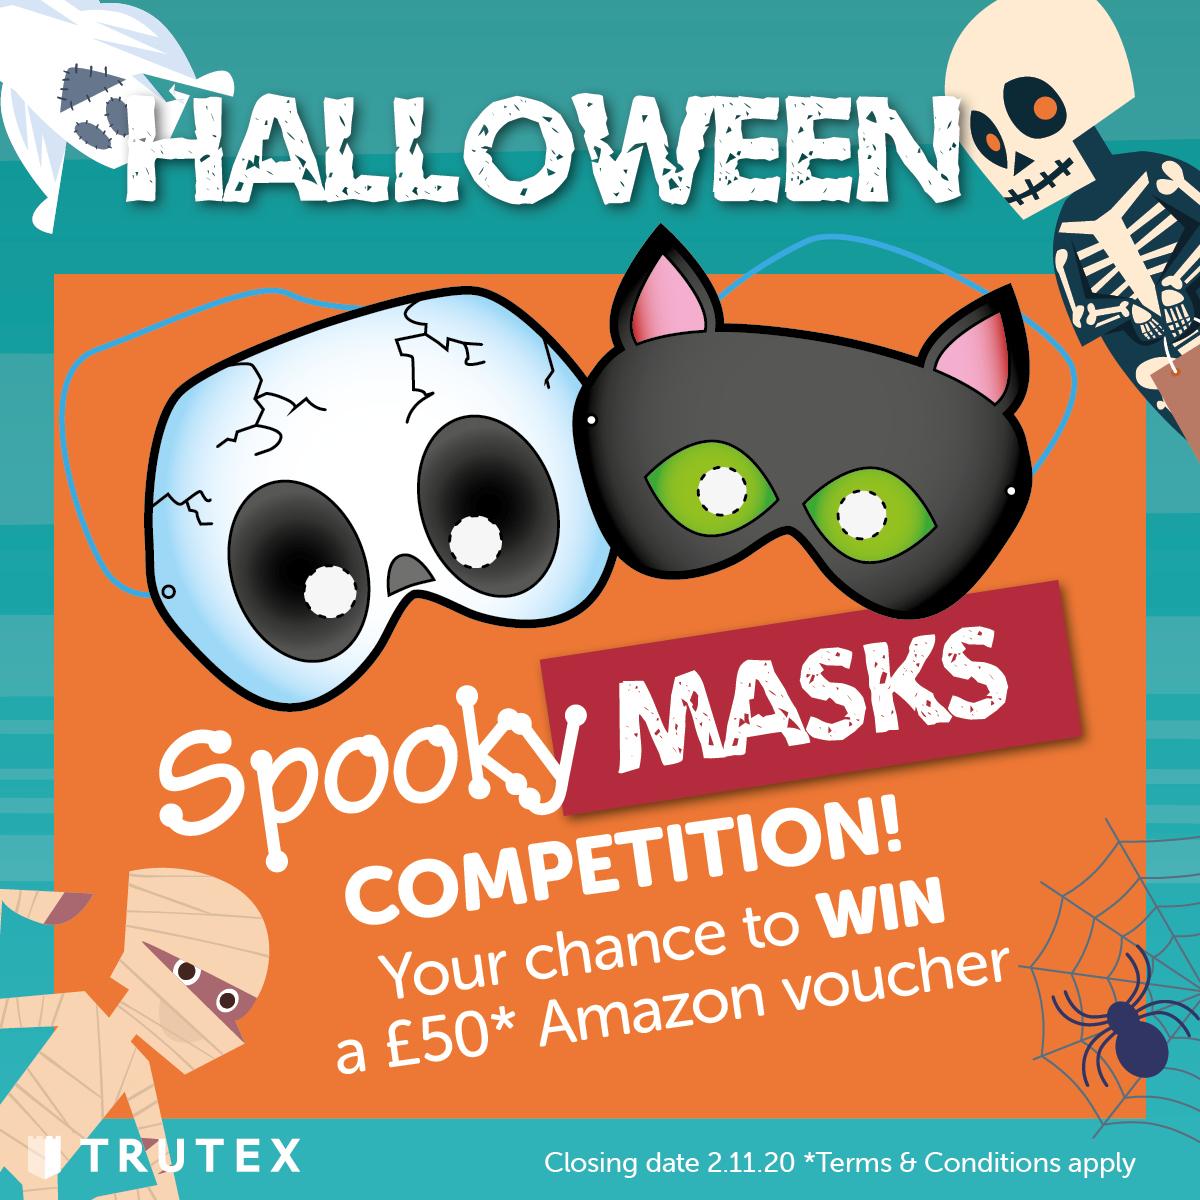 Halloween Activities & Competition